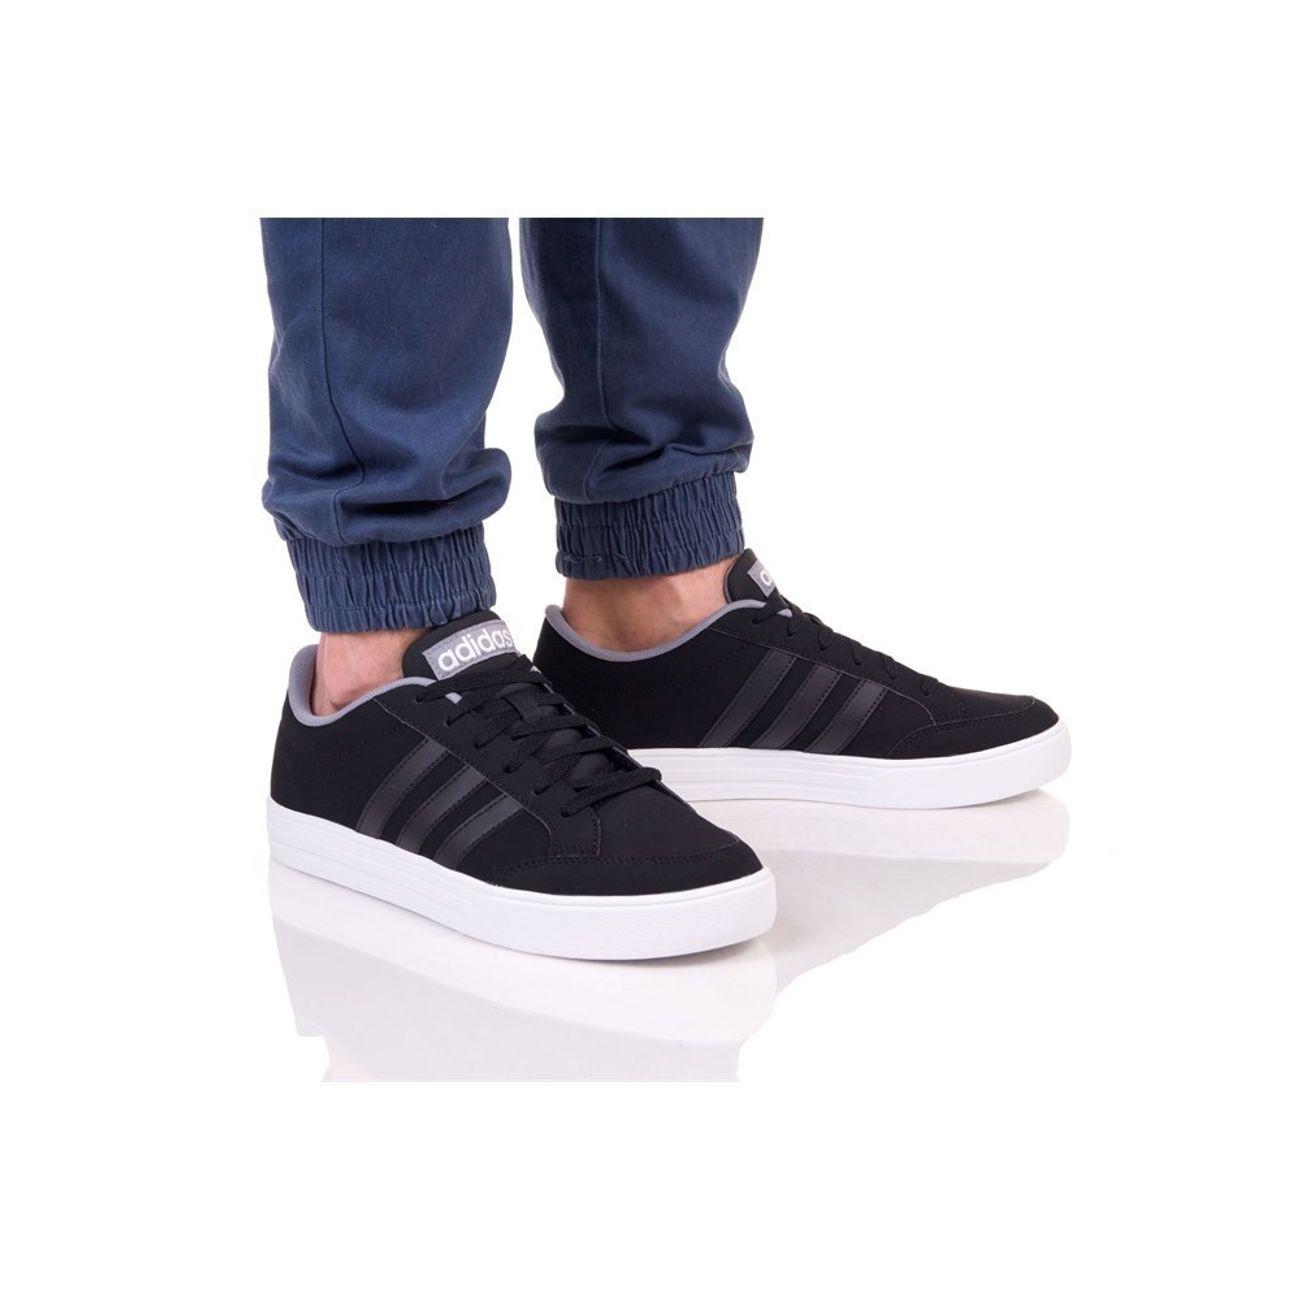 Set Adidas Adidas Homme Vs Homme 80OmwvNn